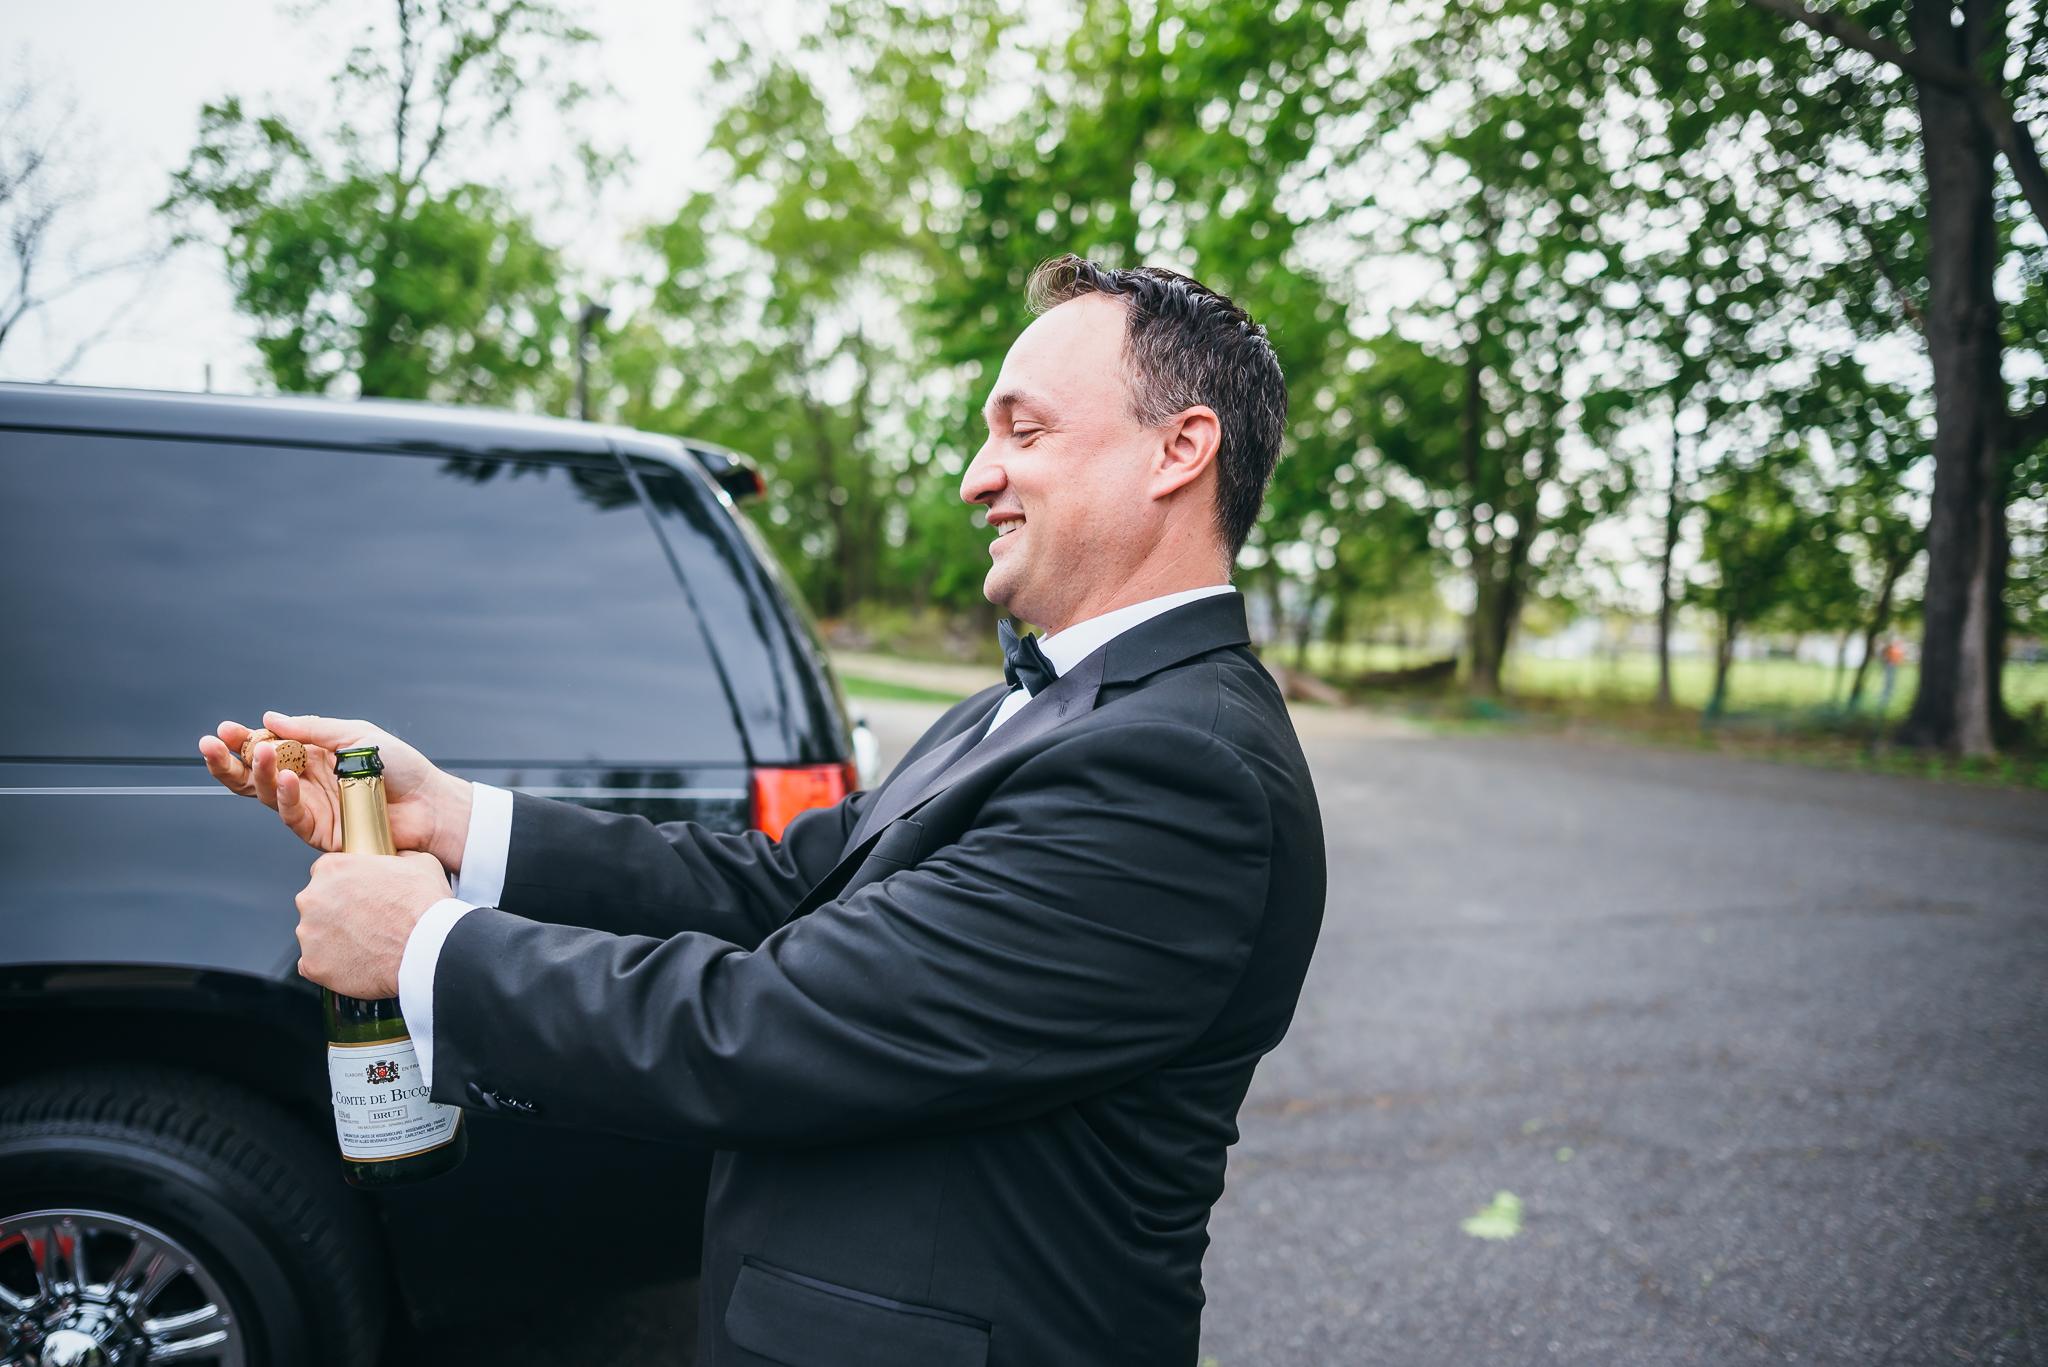 philadelphia-wedding-photographer-0021.jpg